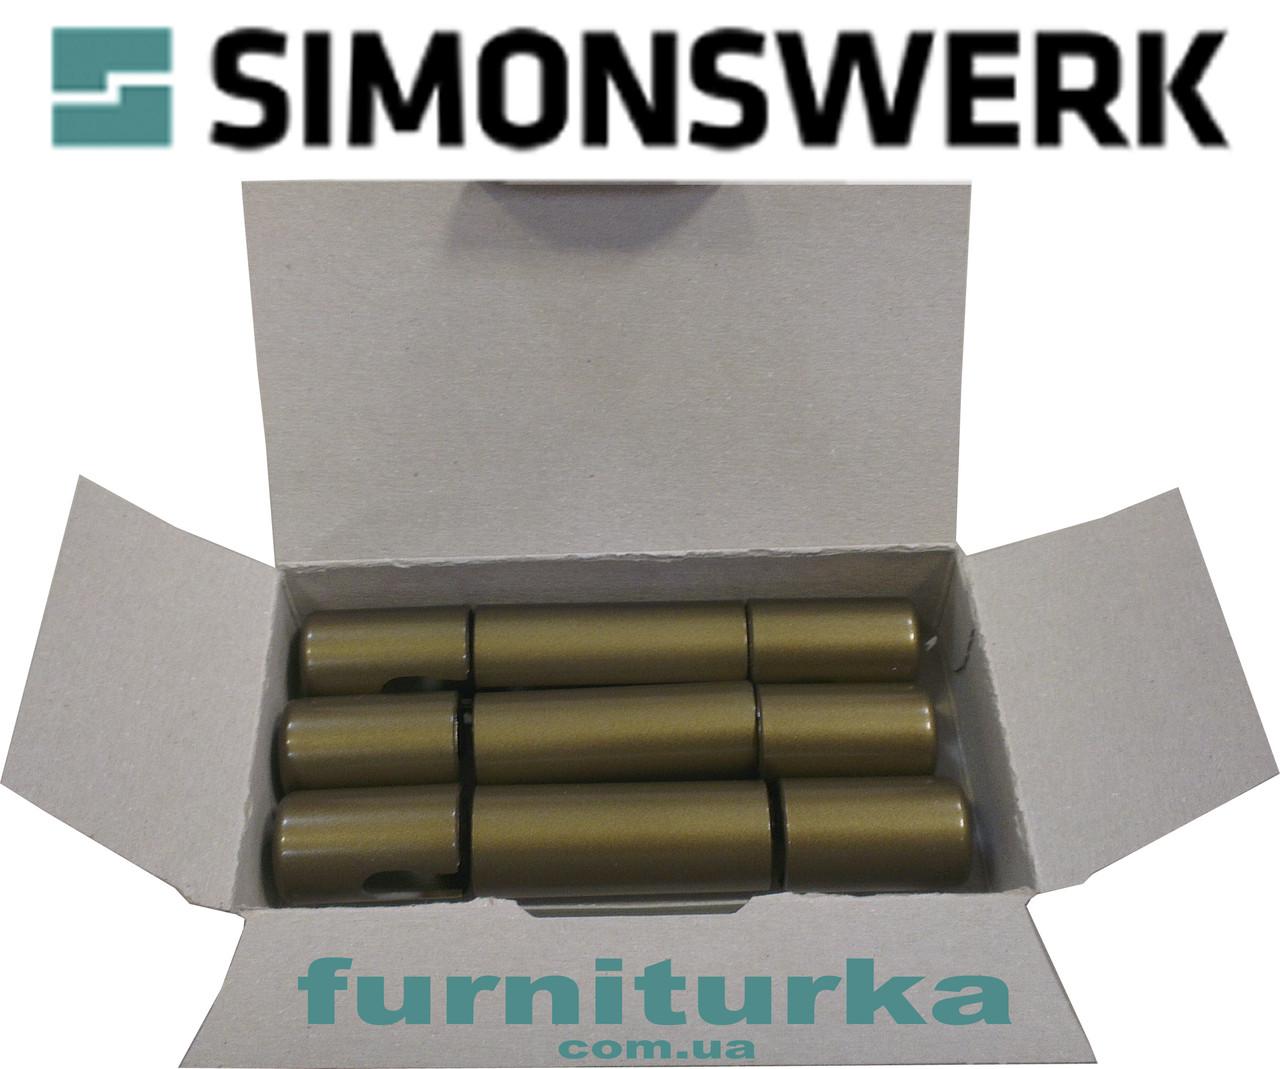 Декоративная накладка №12 на петлю SIMONSWERK серия BAKA 4000 (бронза)